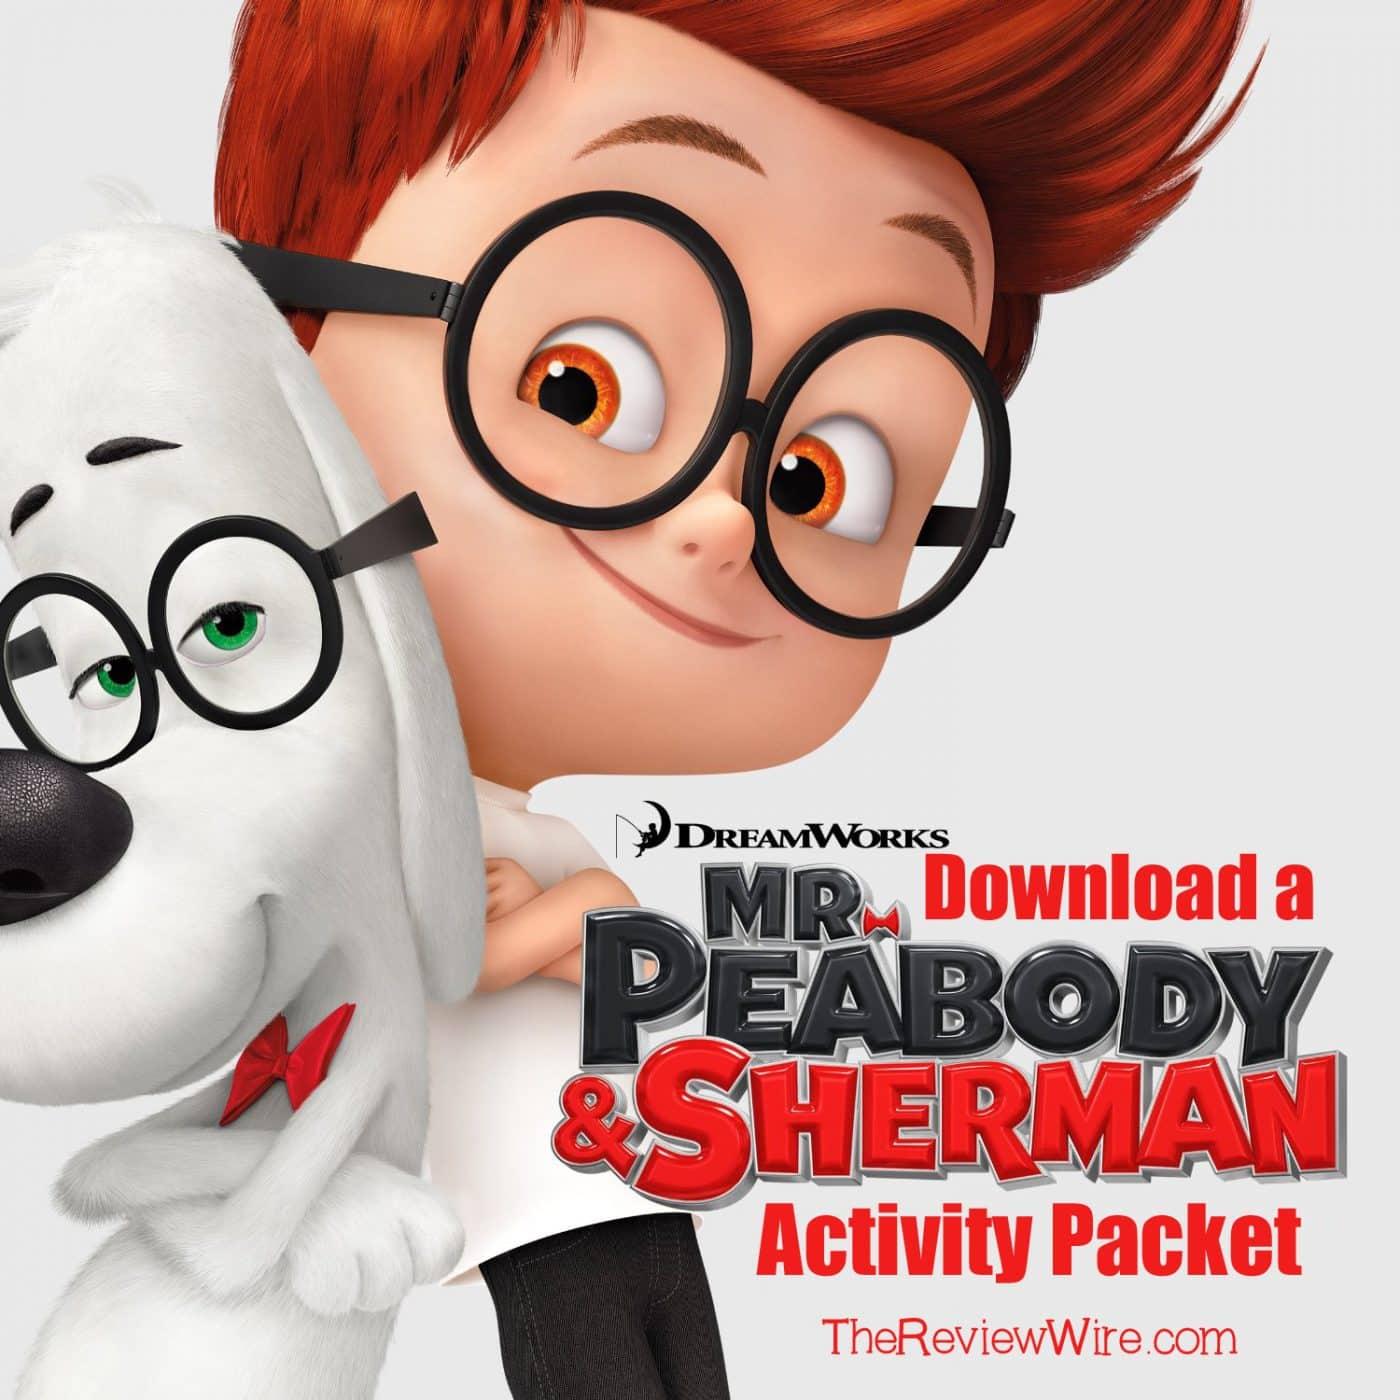 MR. PEABODY & SHERMAN Activity Packet